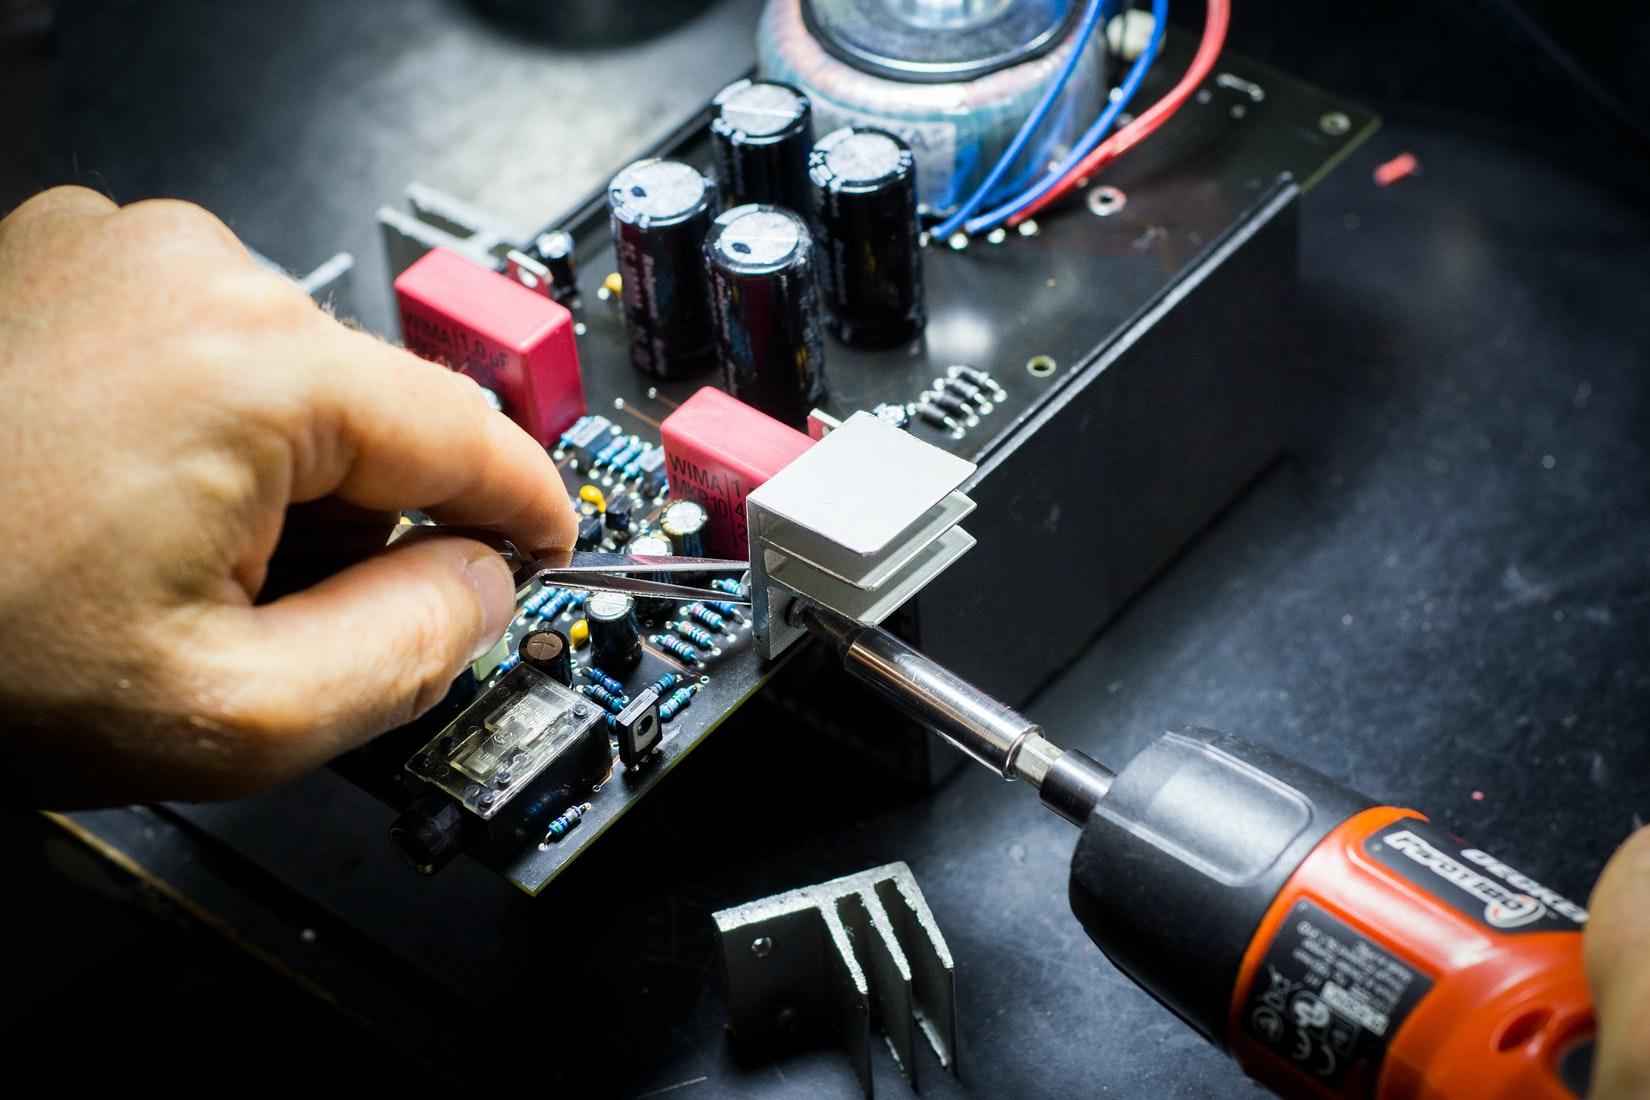 hardware design services promwad